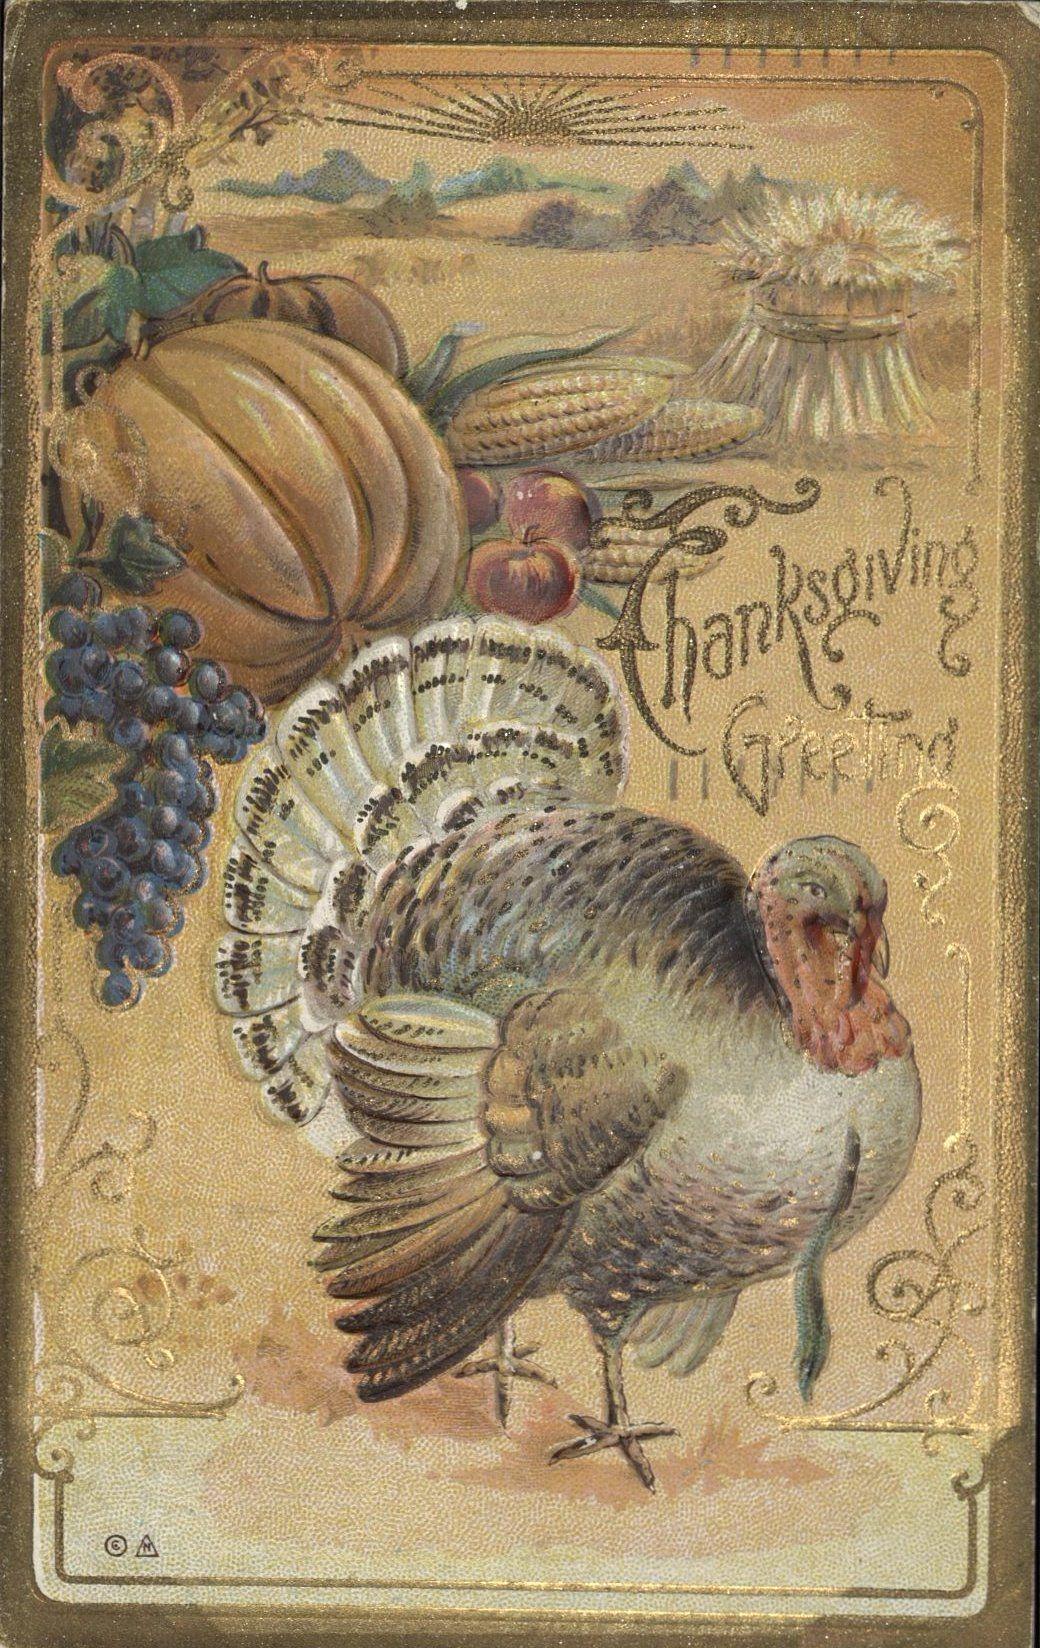 thanskgiving postcard